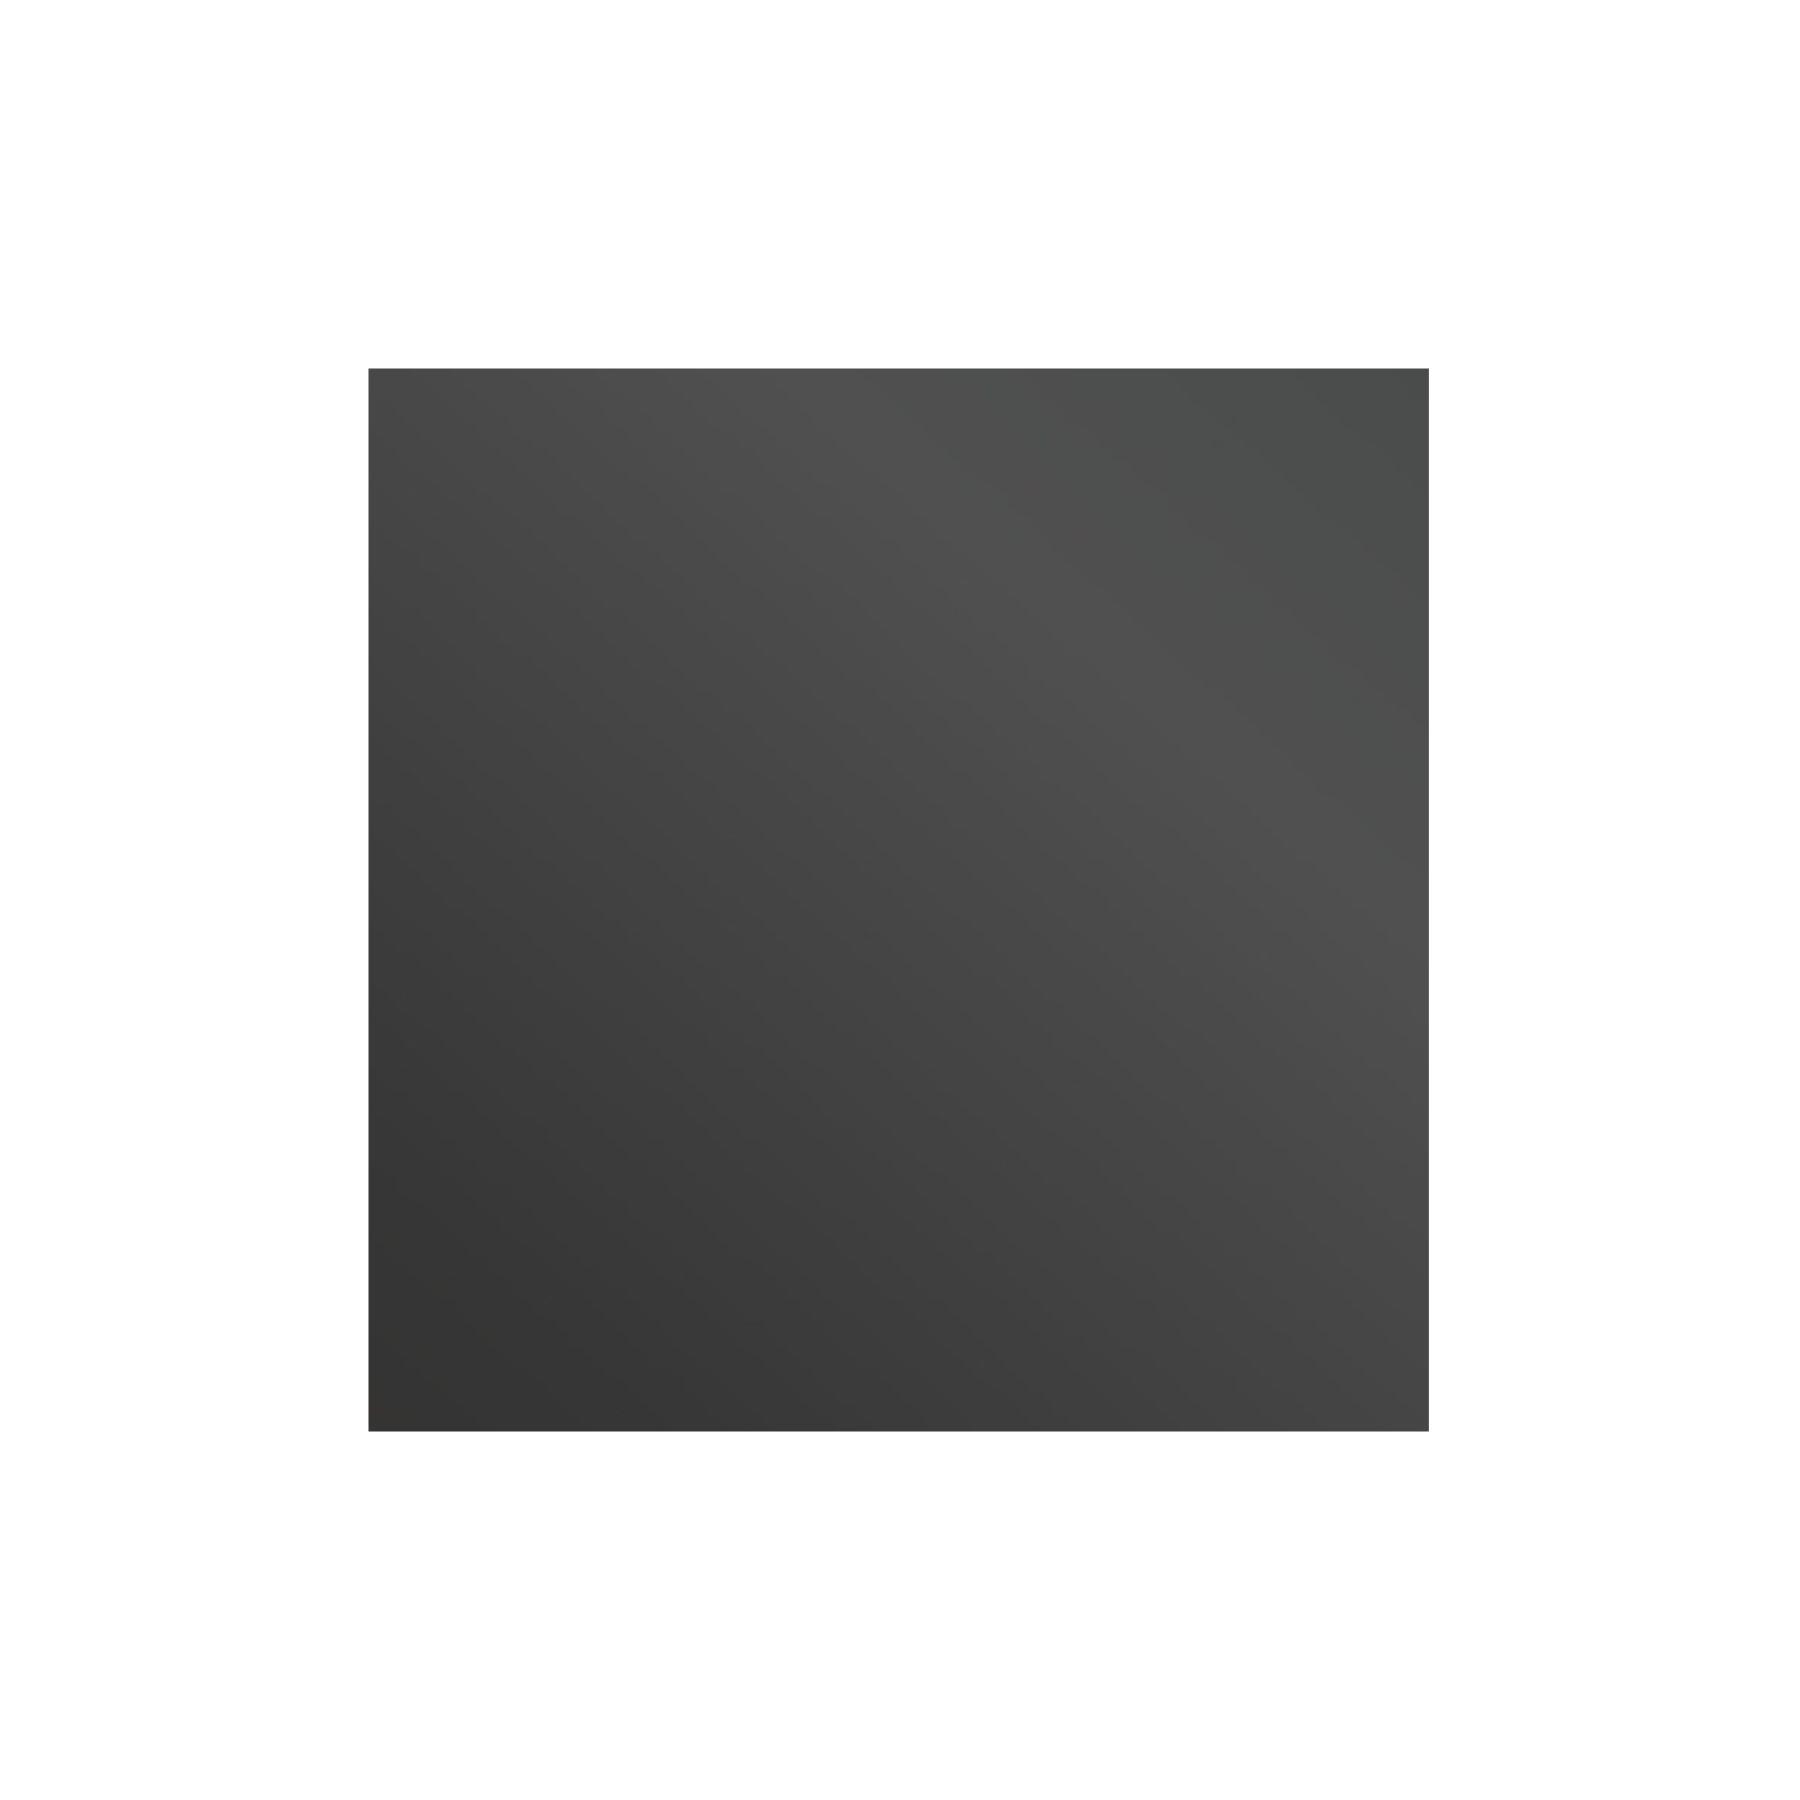 Vinilo textil Easyweed® Electric hoja 30 x 38 cm Gris tungsteno